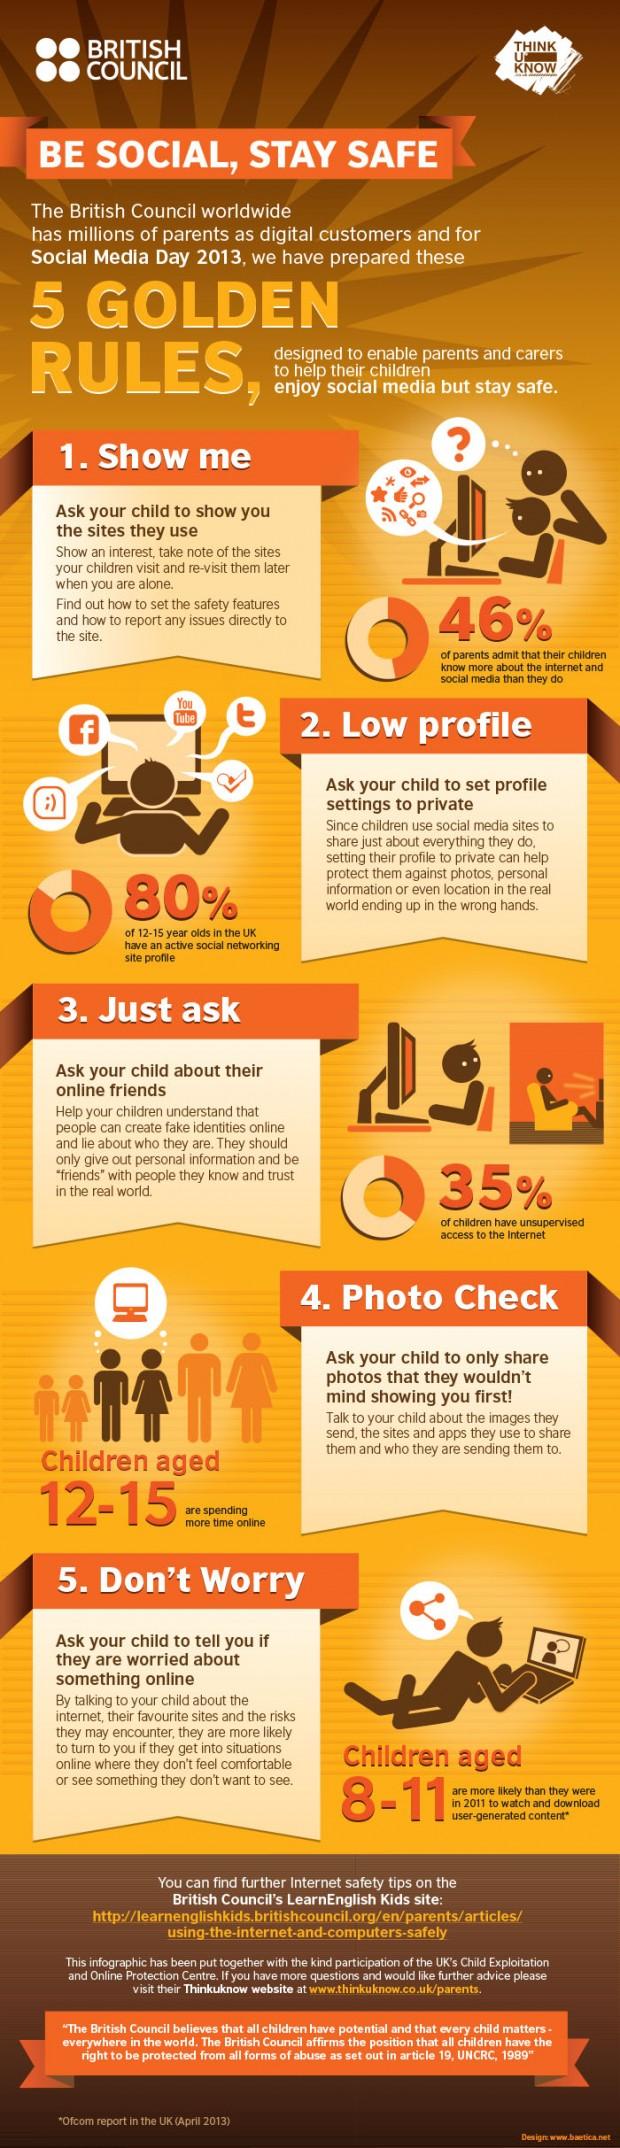 AspirantSG Be Social Stay Safe